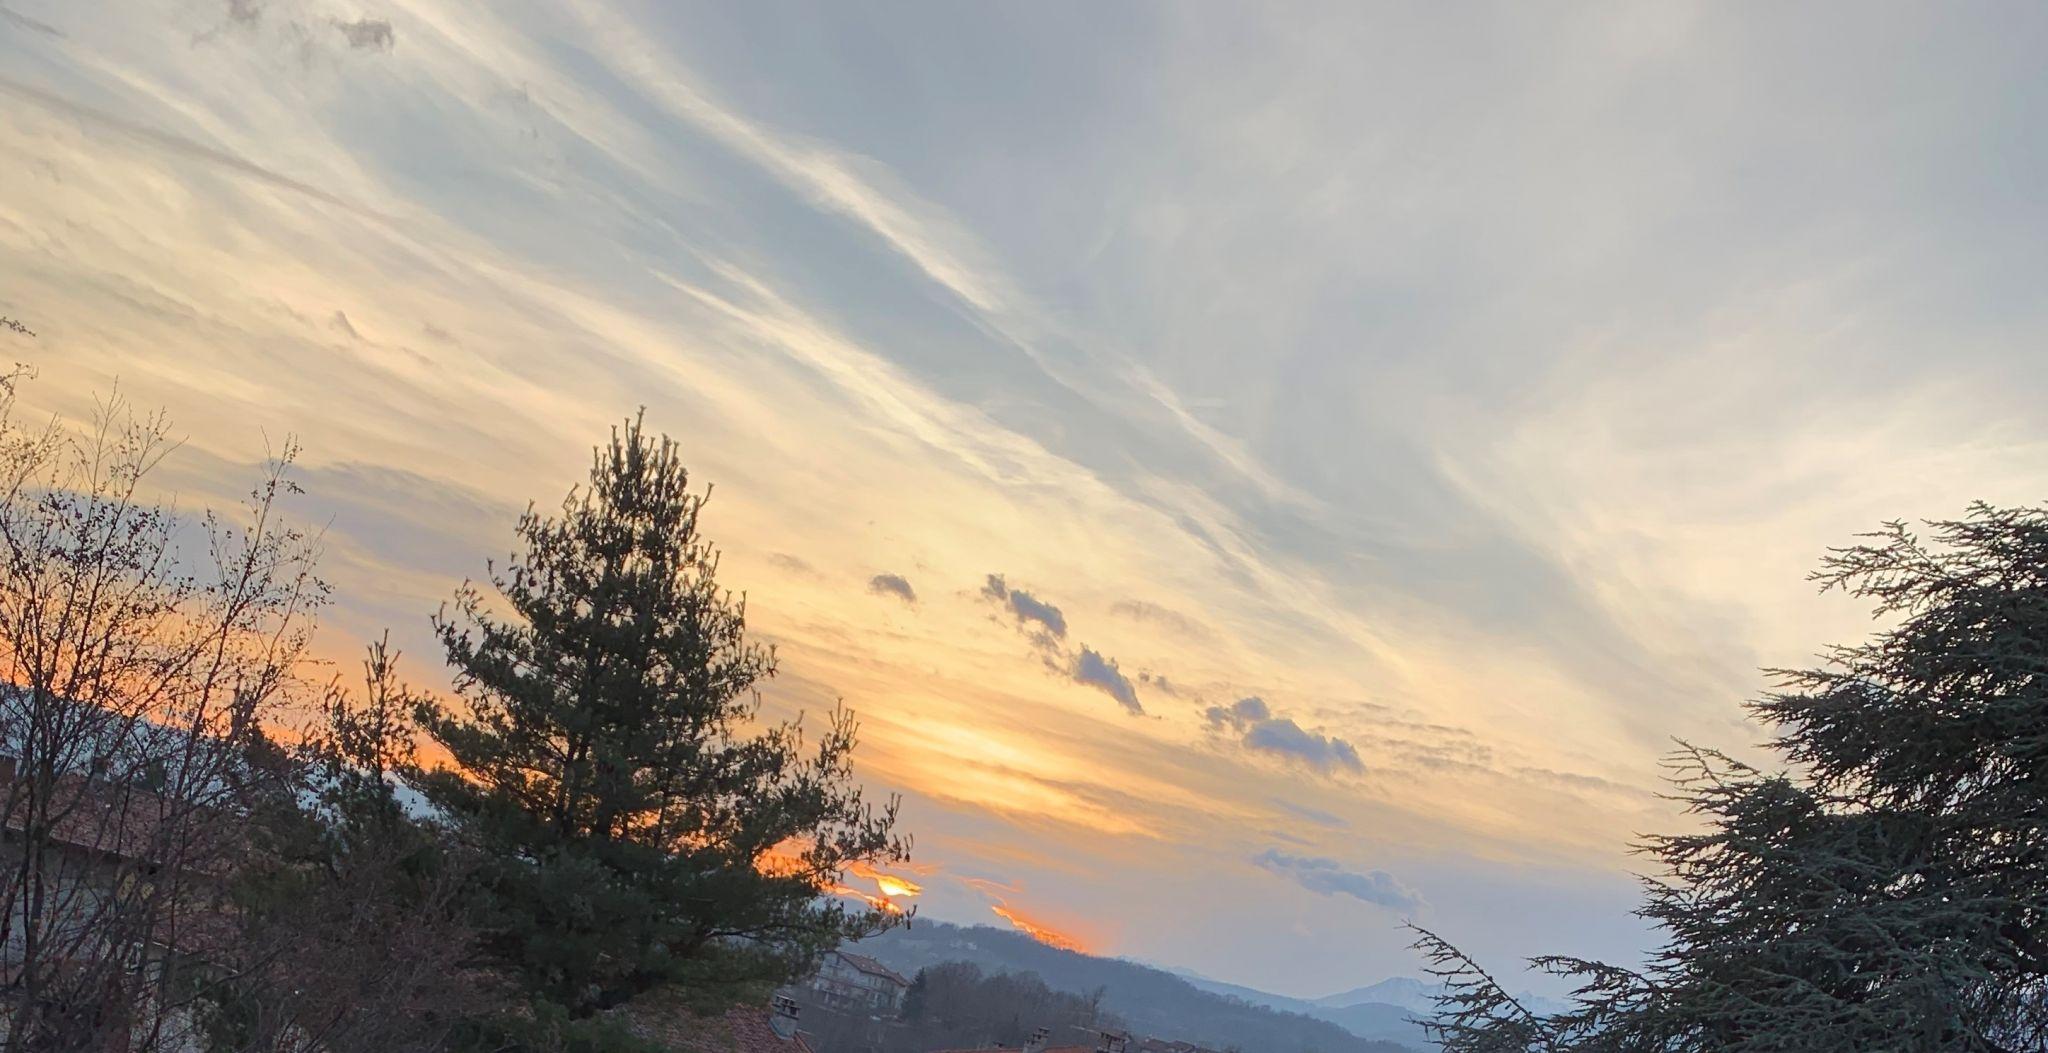 iPhone XR camera sunset